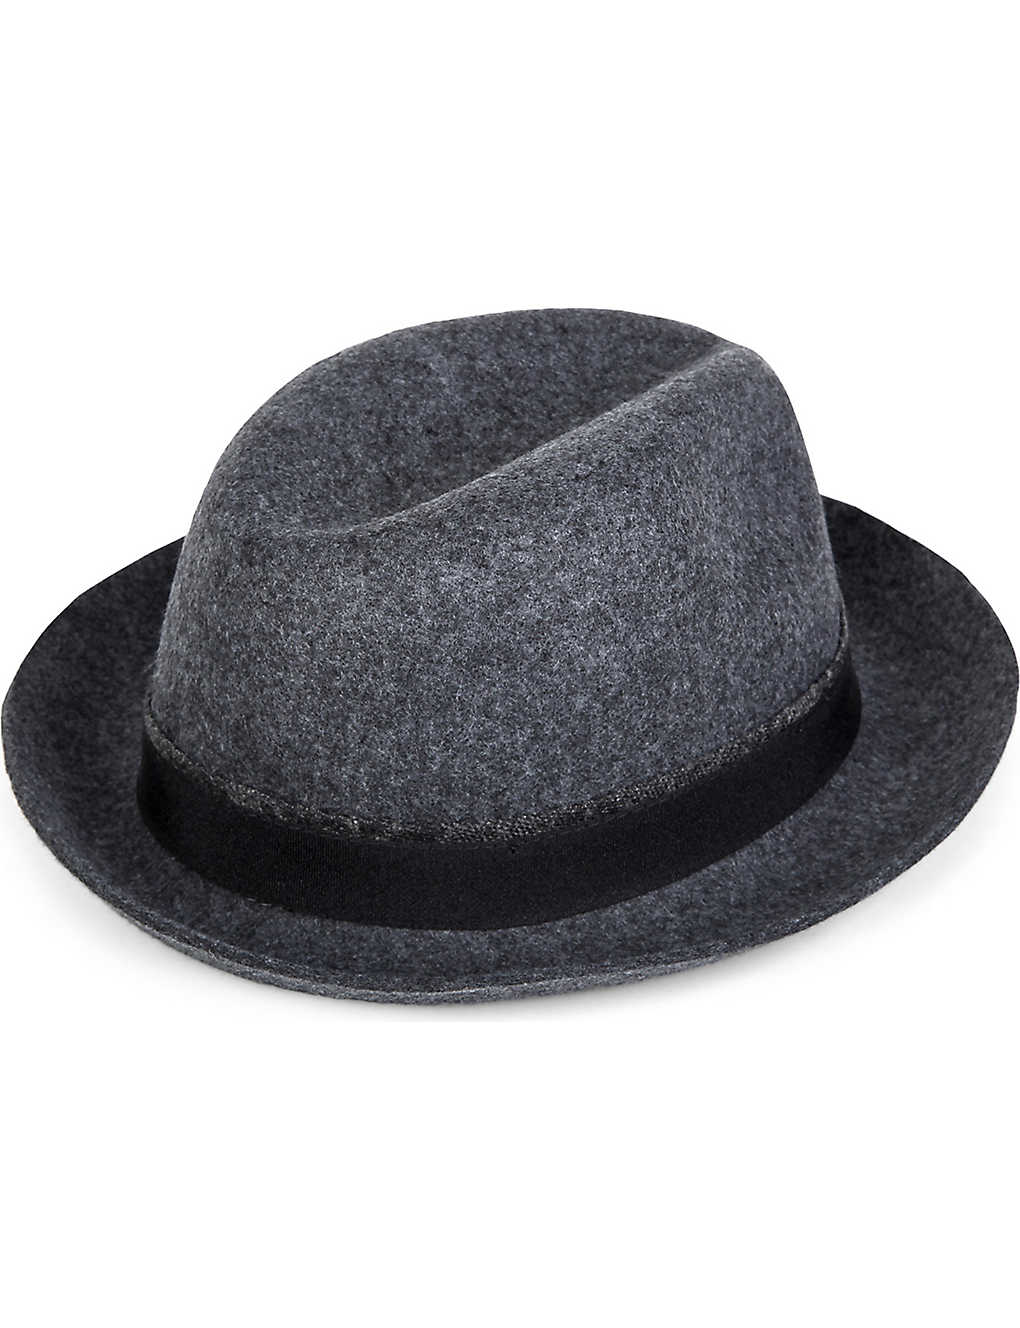 2cc685150eab3 TED BAKER - Hattie contrast band fedora hat